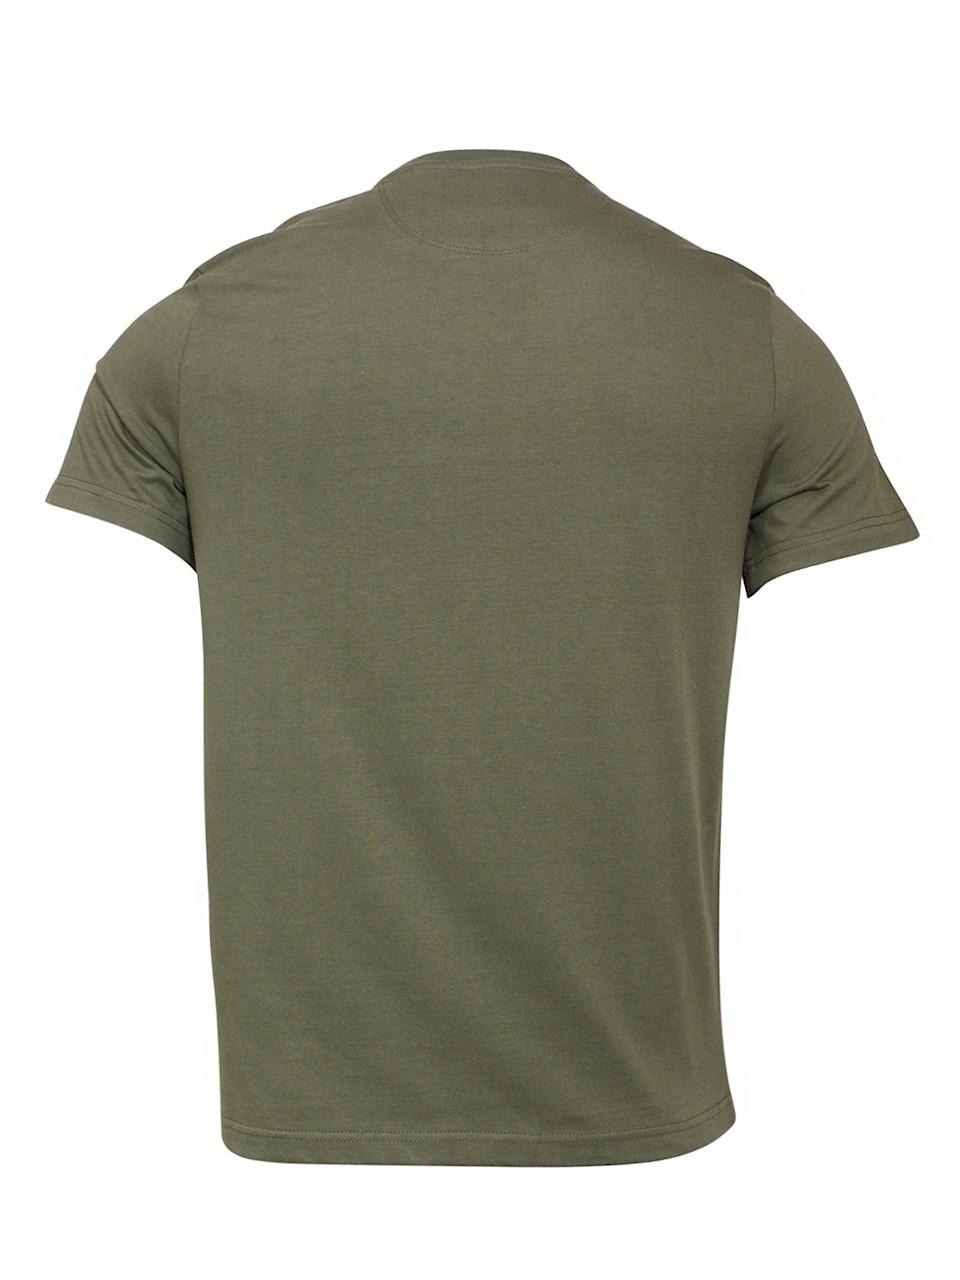 Avirex-Men-039-s-Wingstar-Short-Sleeve-Crew-Neck-Cotton-T-Shirt thumbnail 6